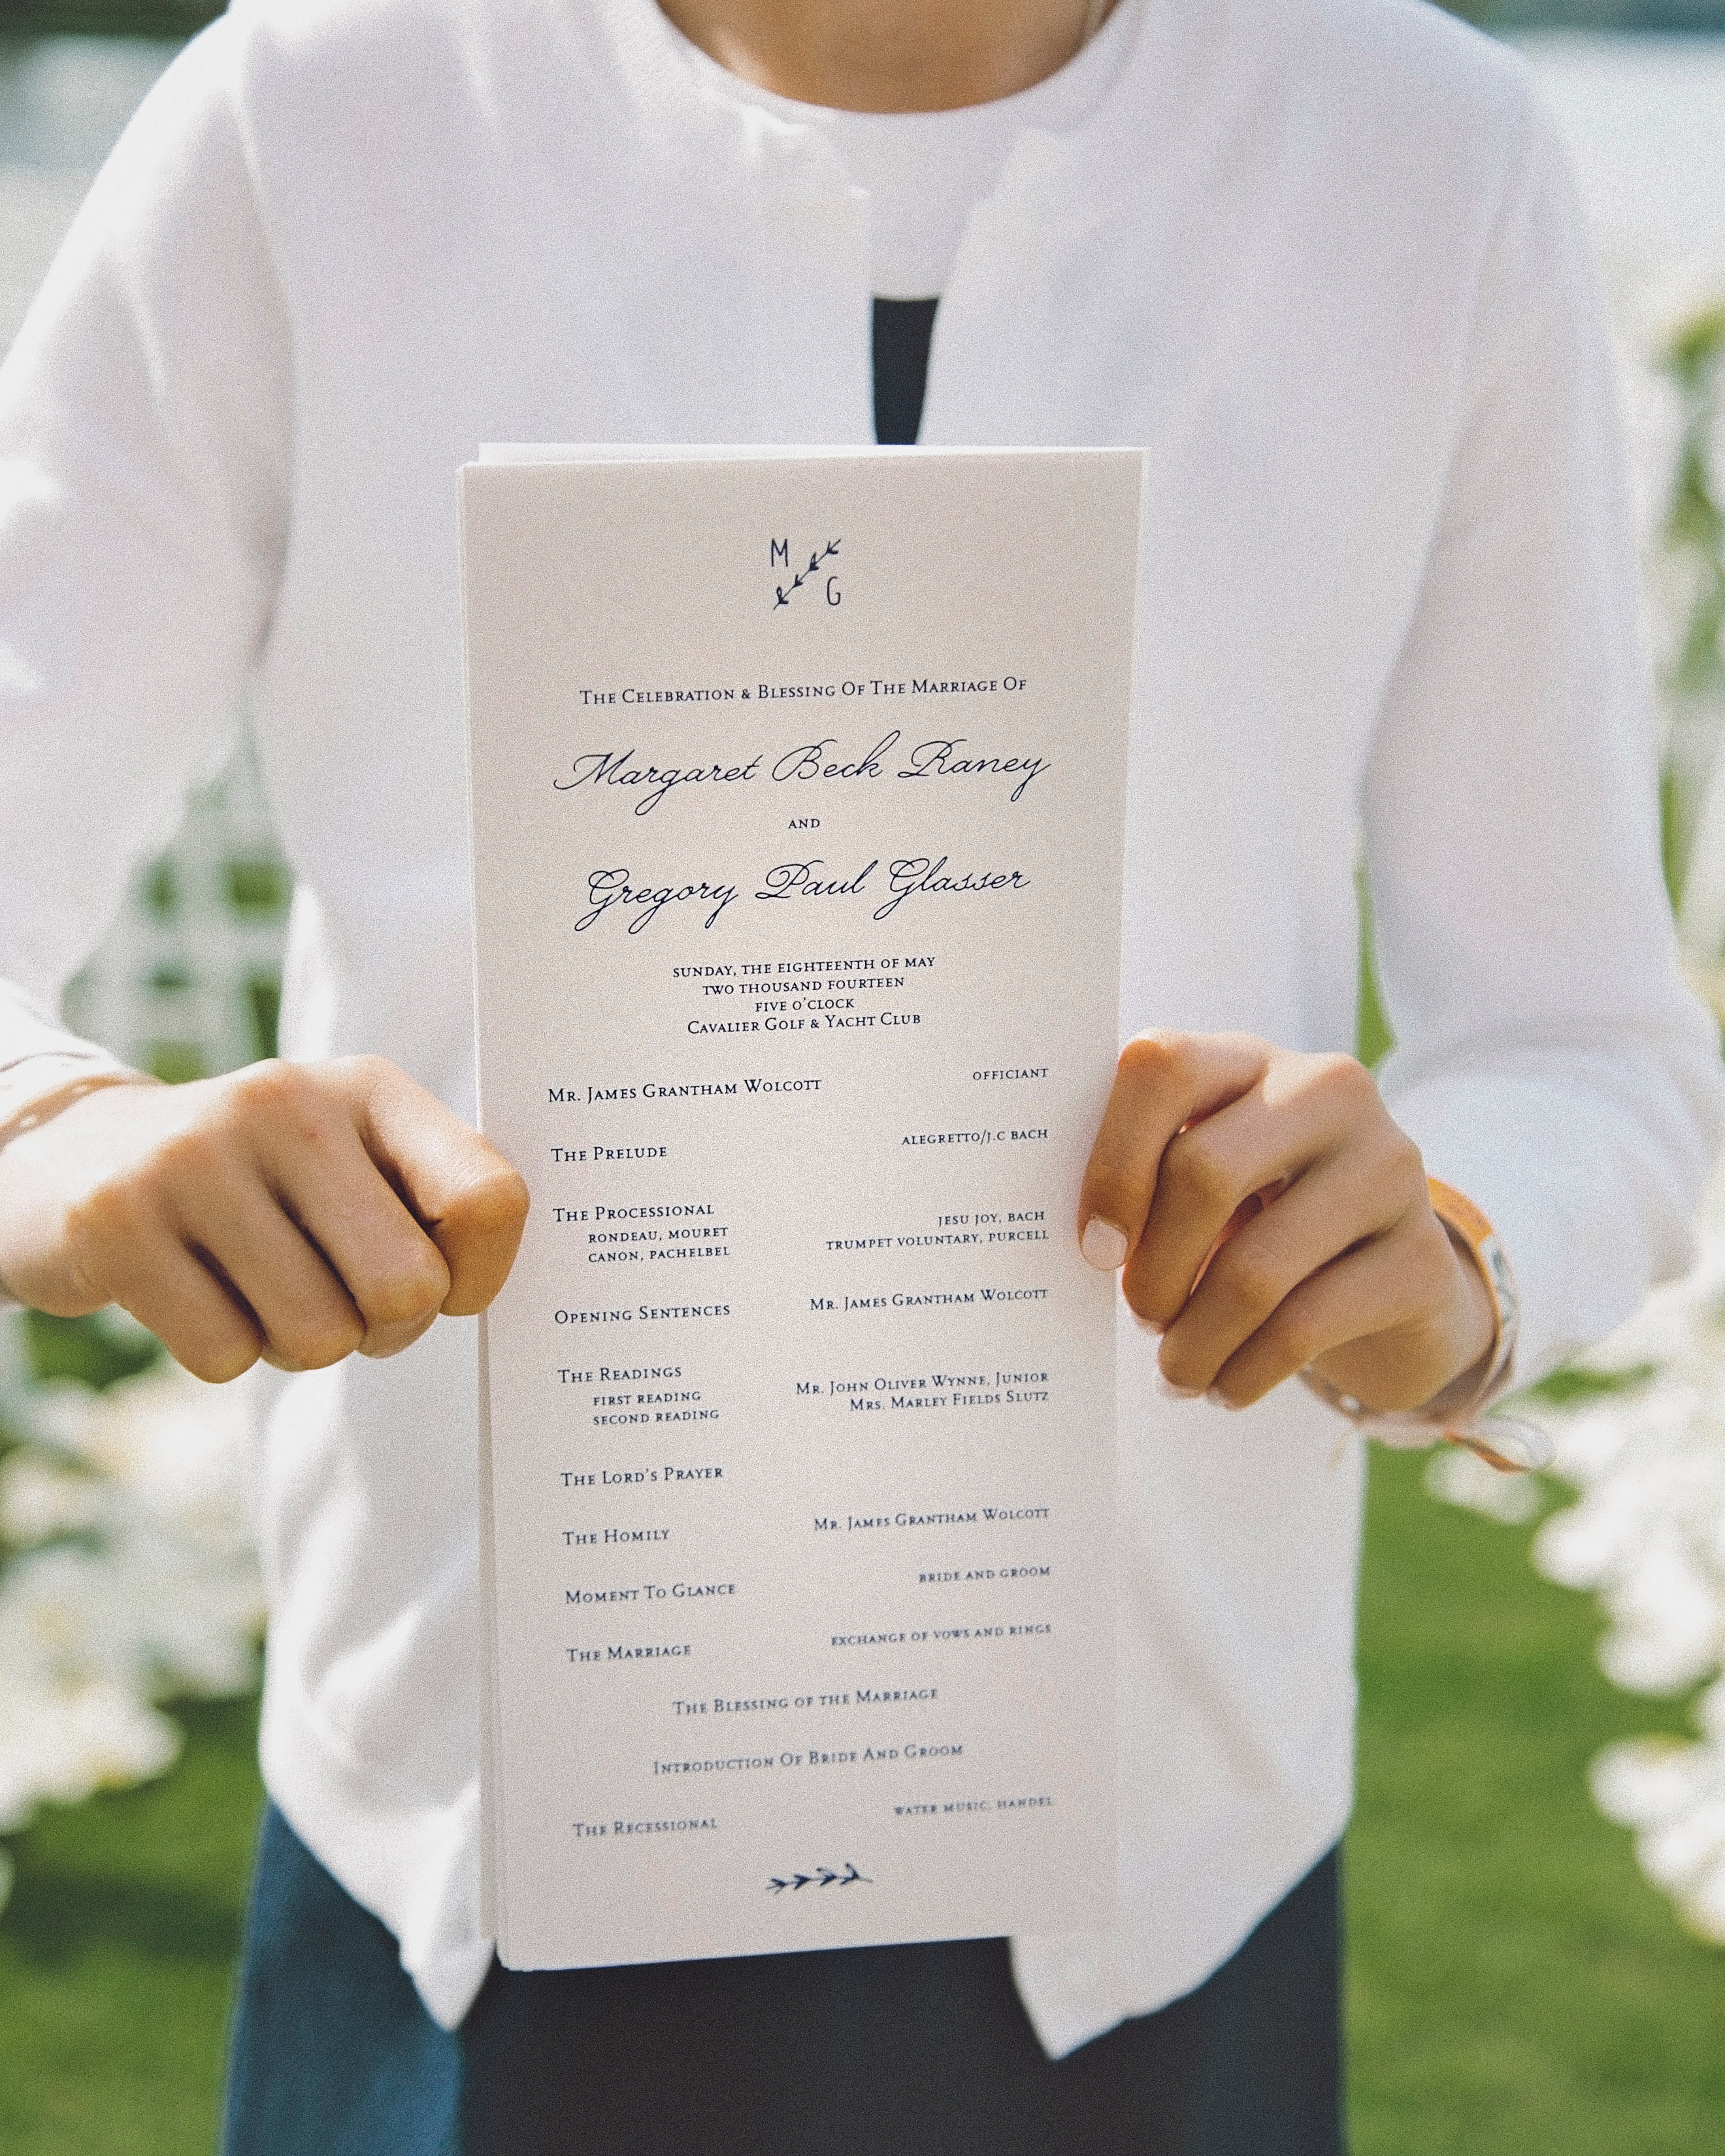 molly-greg-wedding-program-00041-s111481-0814.jpg